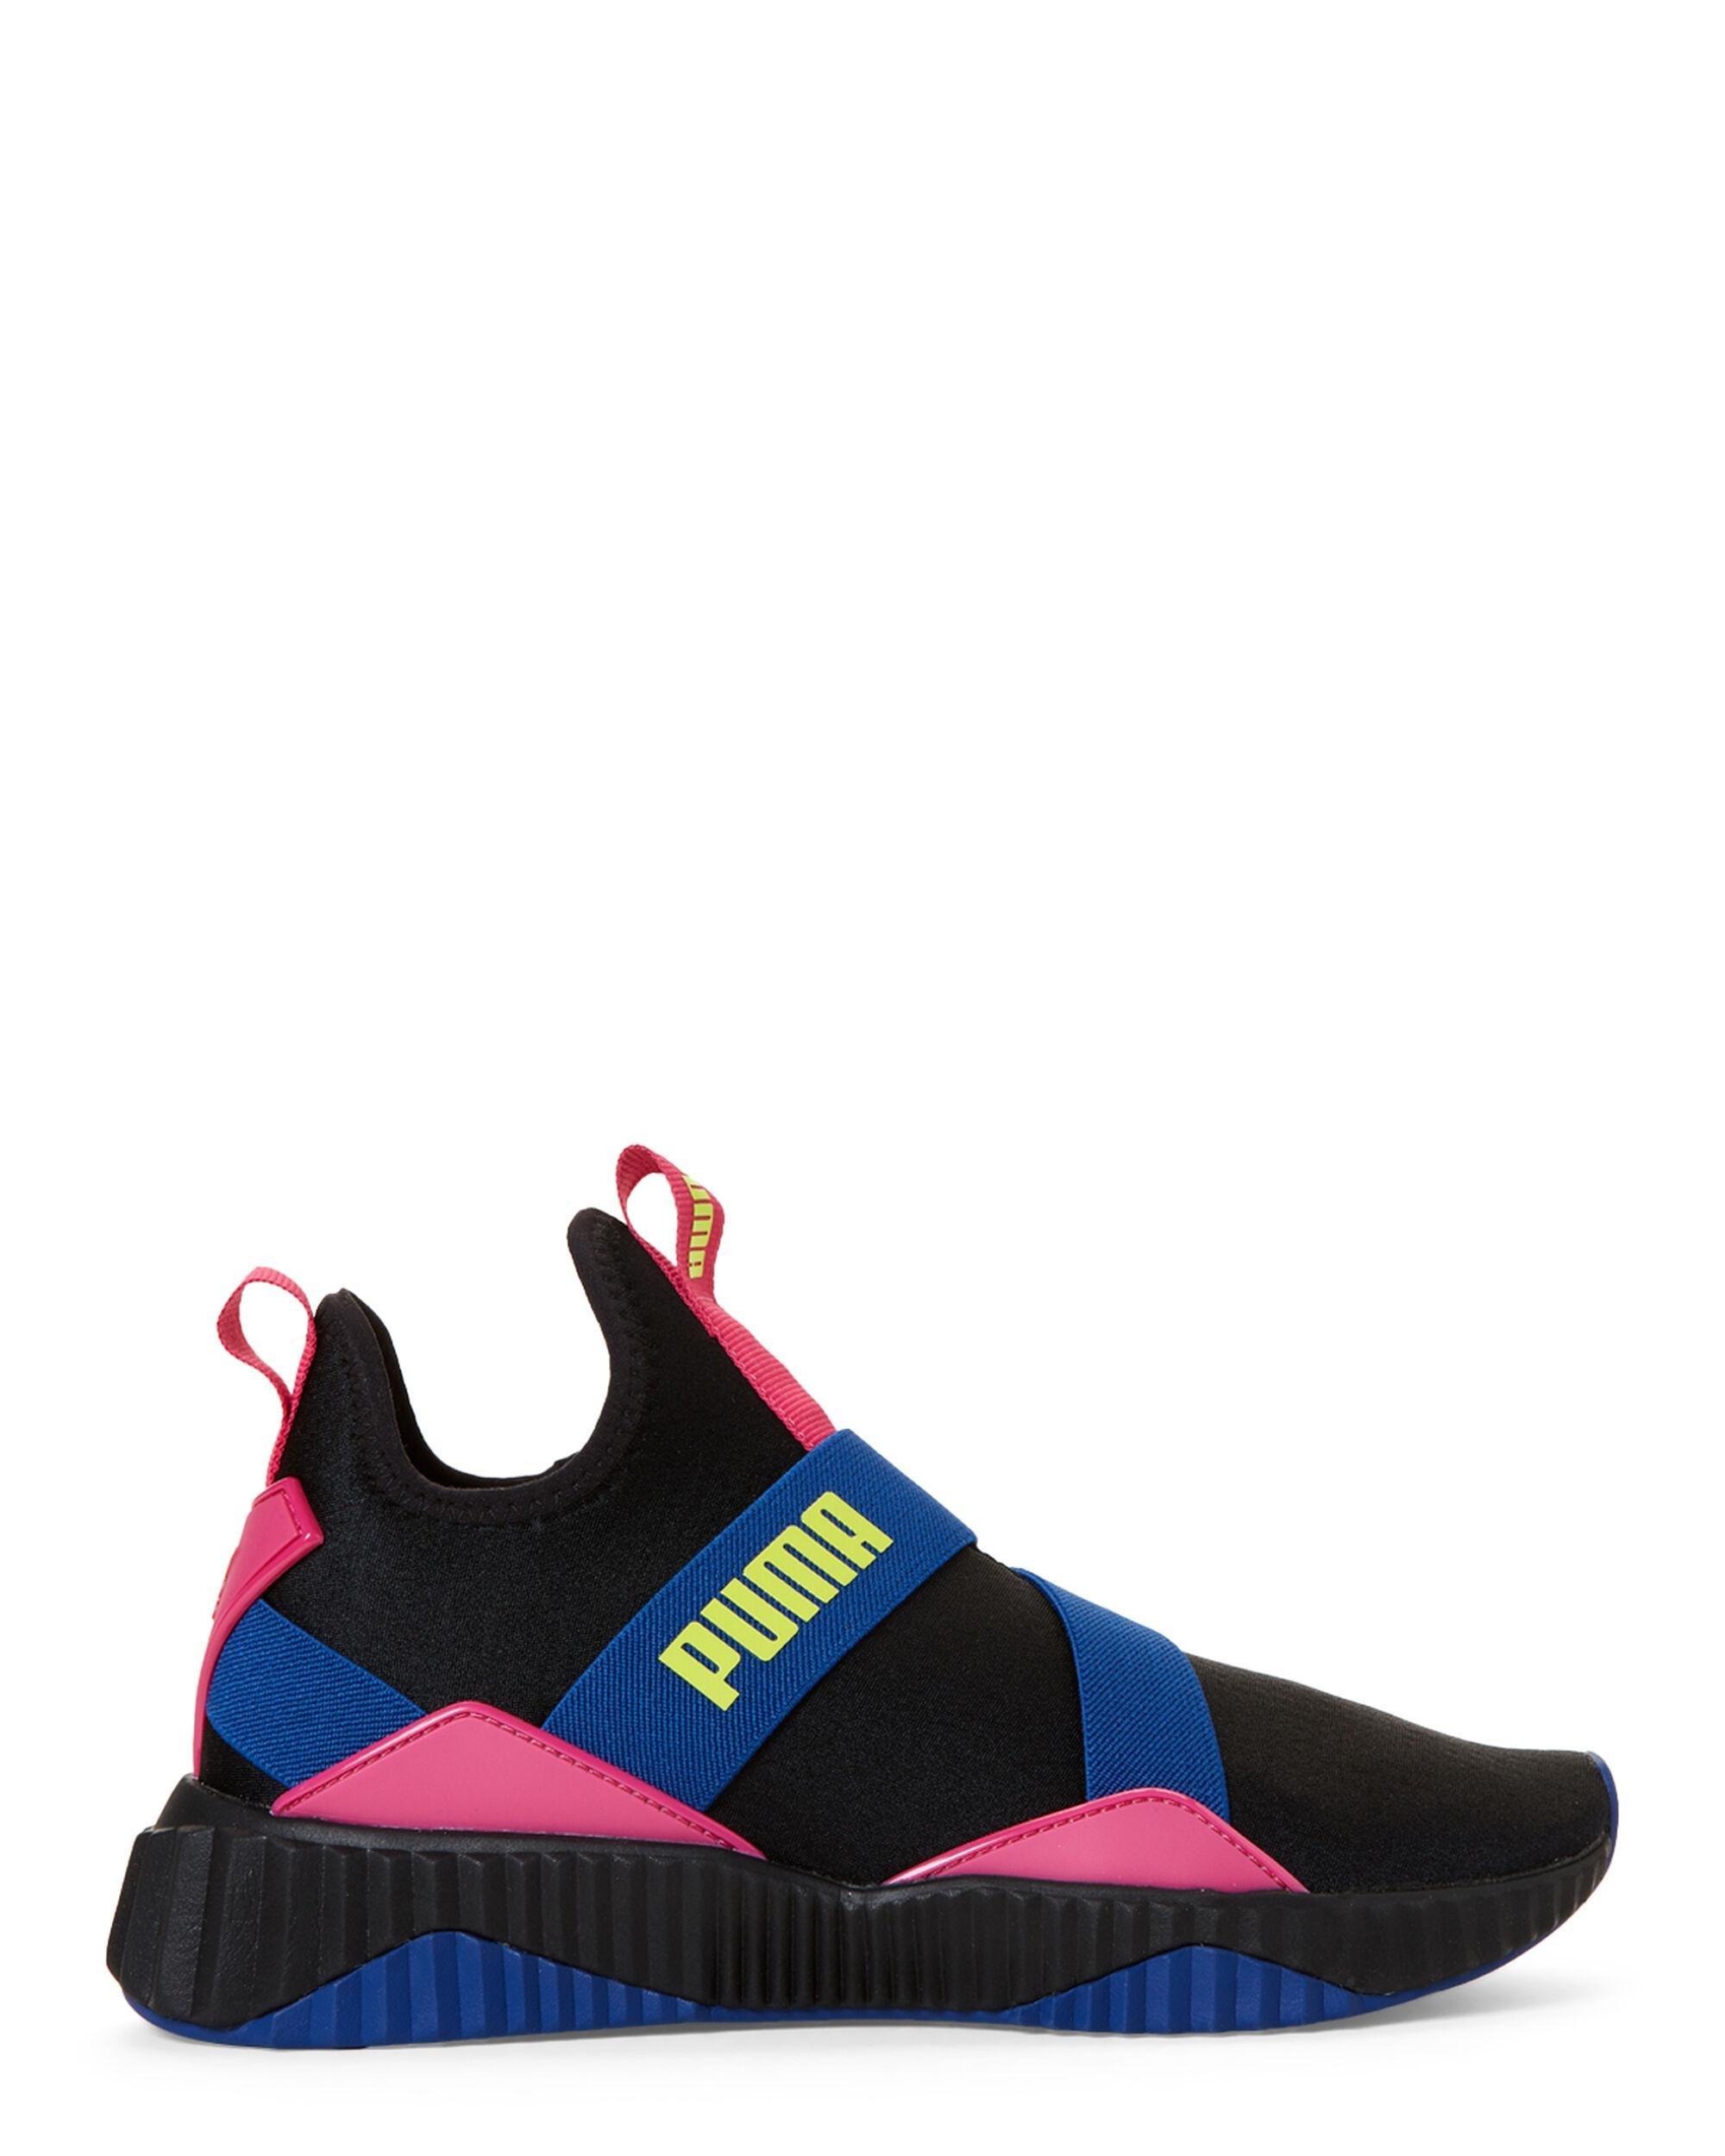 Defy Mid 90s Slip-on Sneakers - Lyst